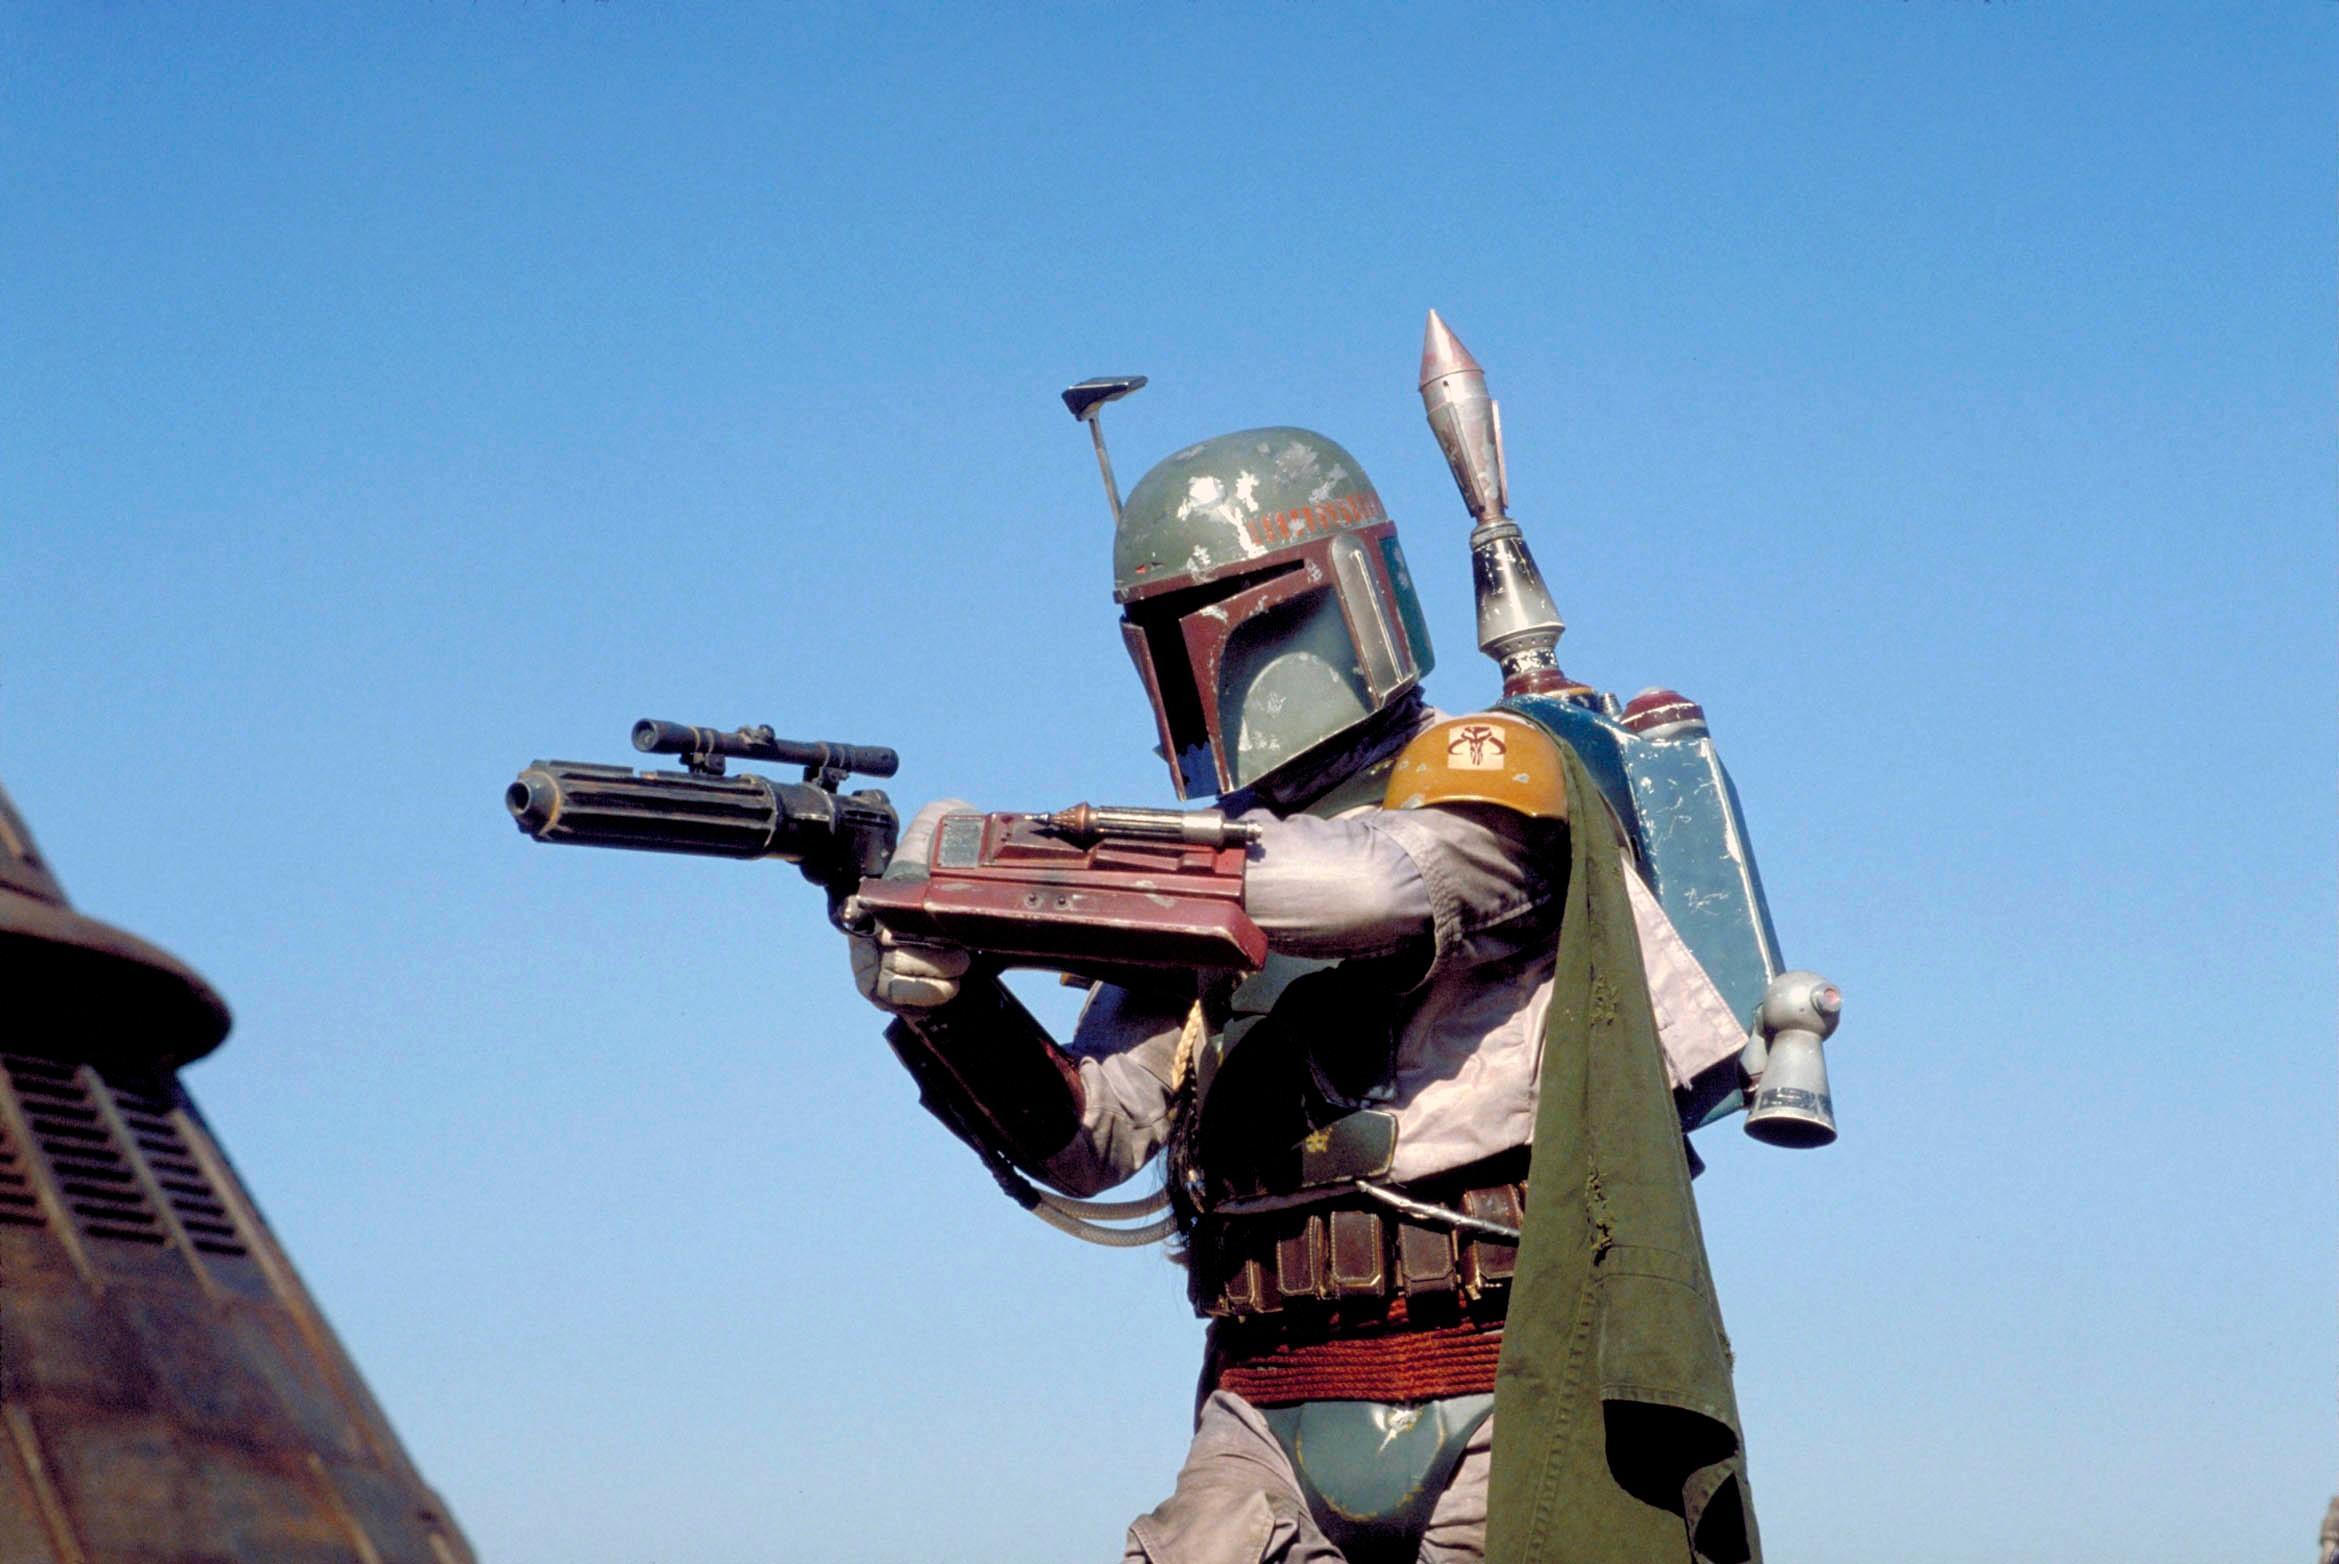 Star Wars Episode VI Return Of The Jedi, Sky pics, lucasfilm, TL